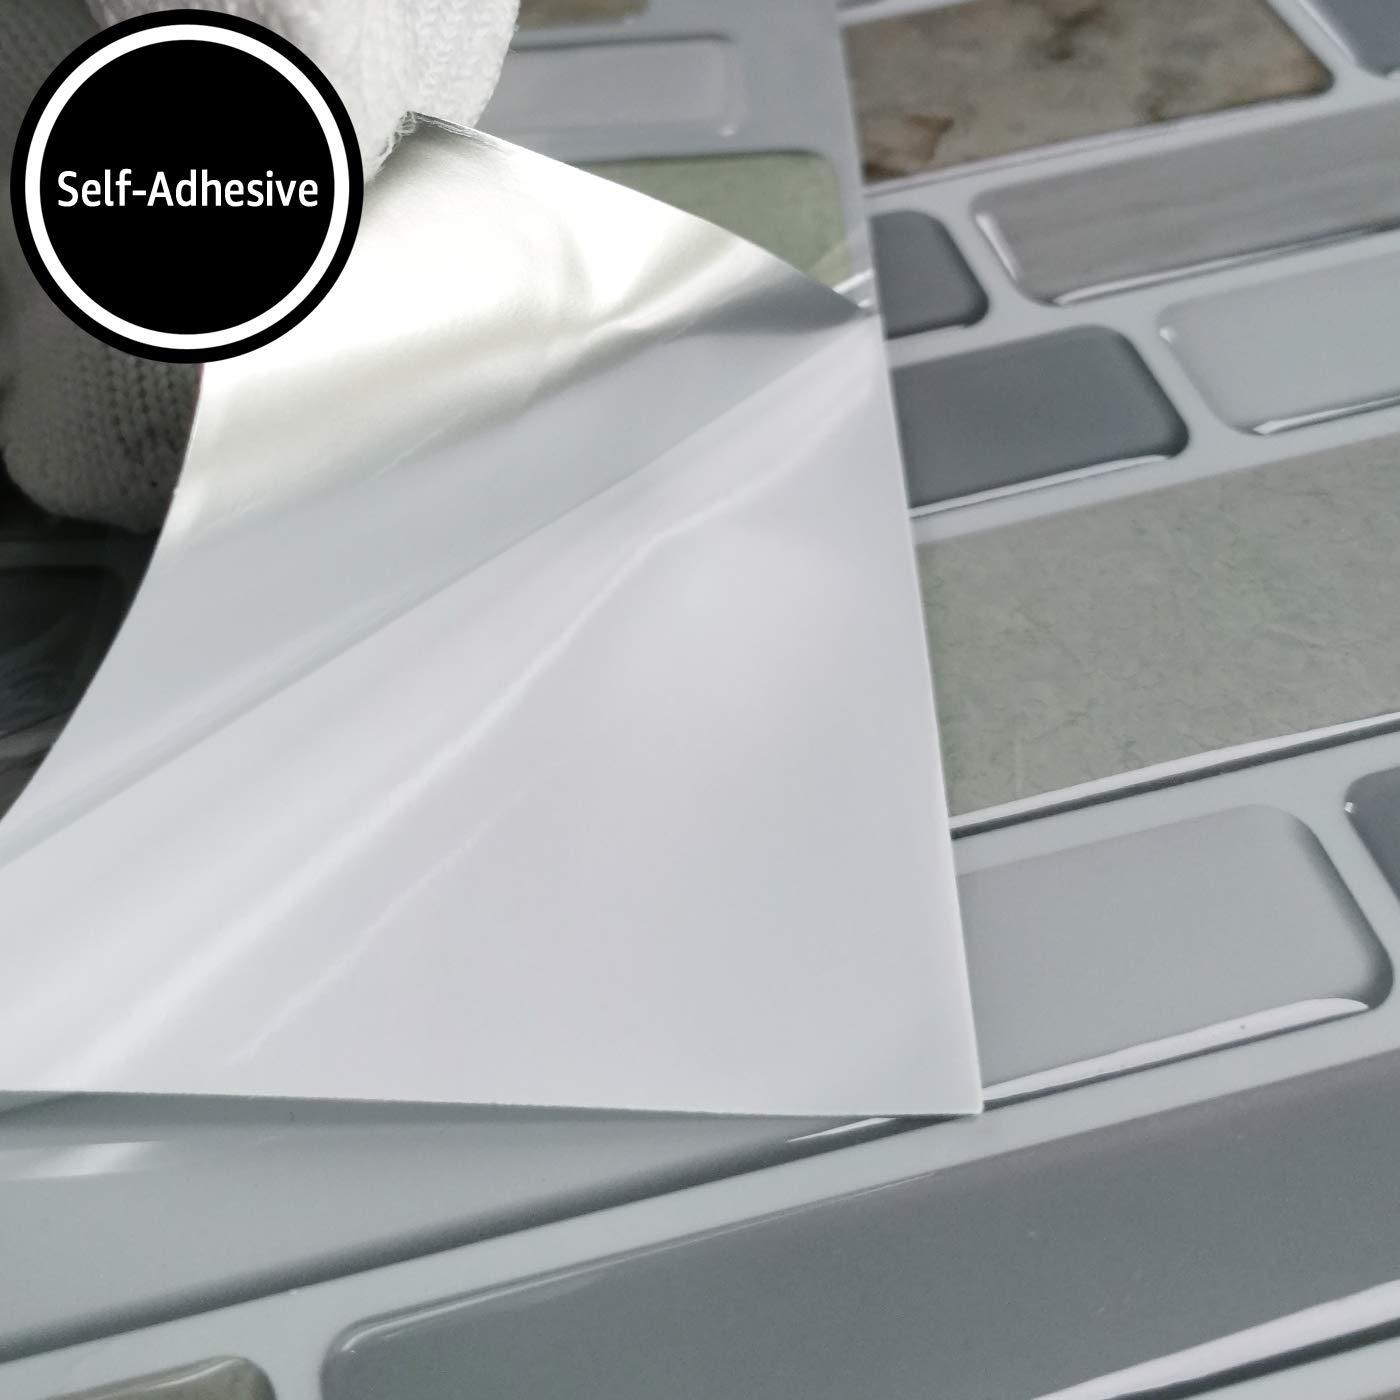 Art3d Peel and Stick Bathroom//Kitchen Backsplash Tiles 6 Tiles